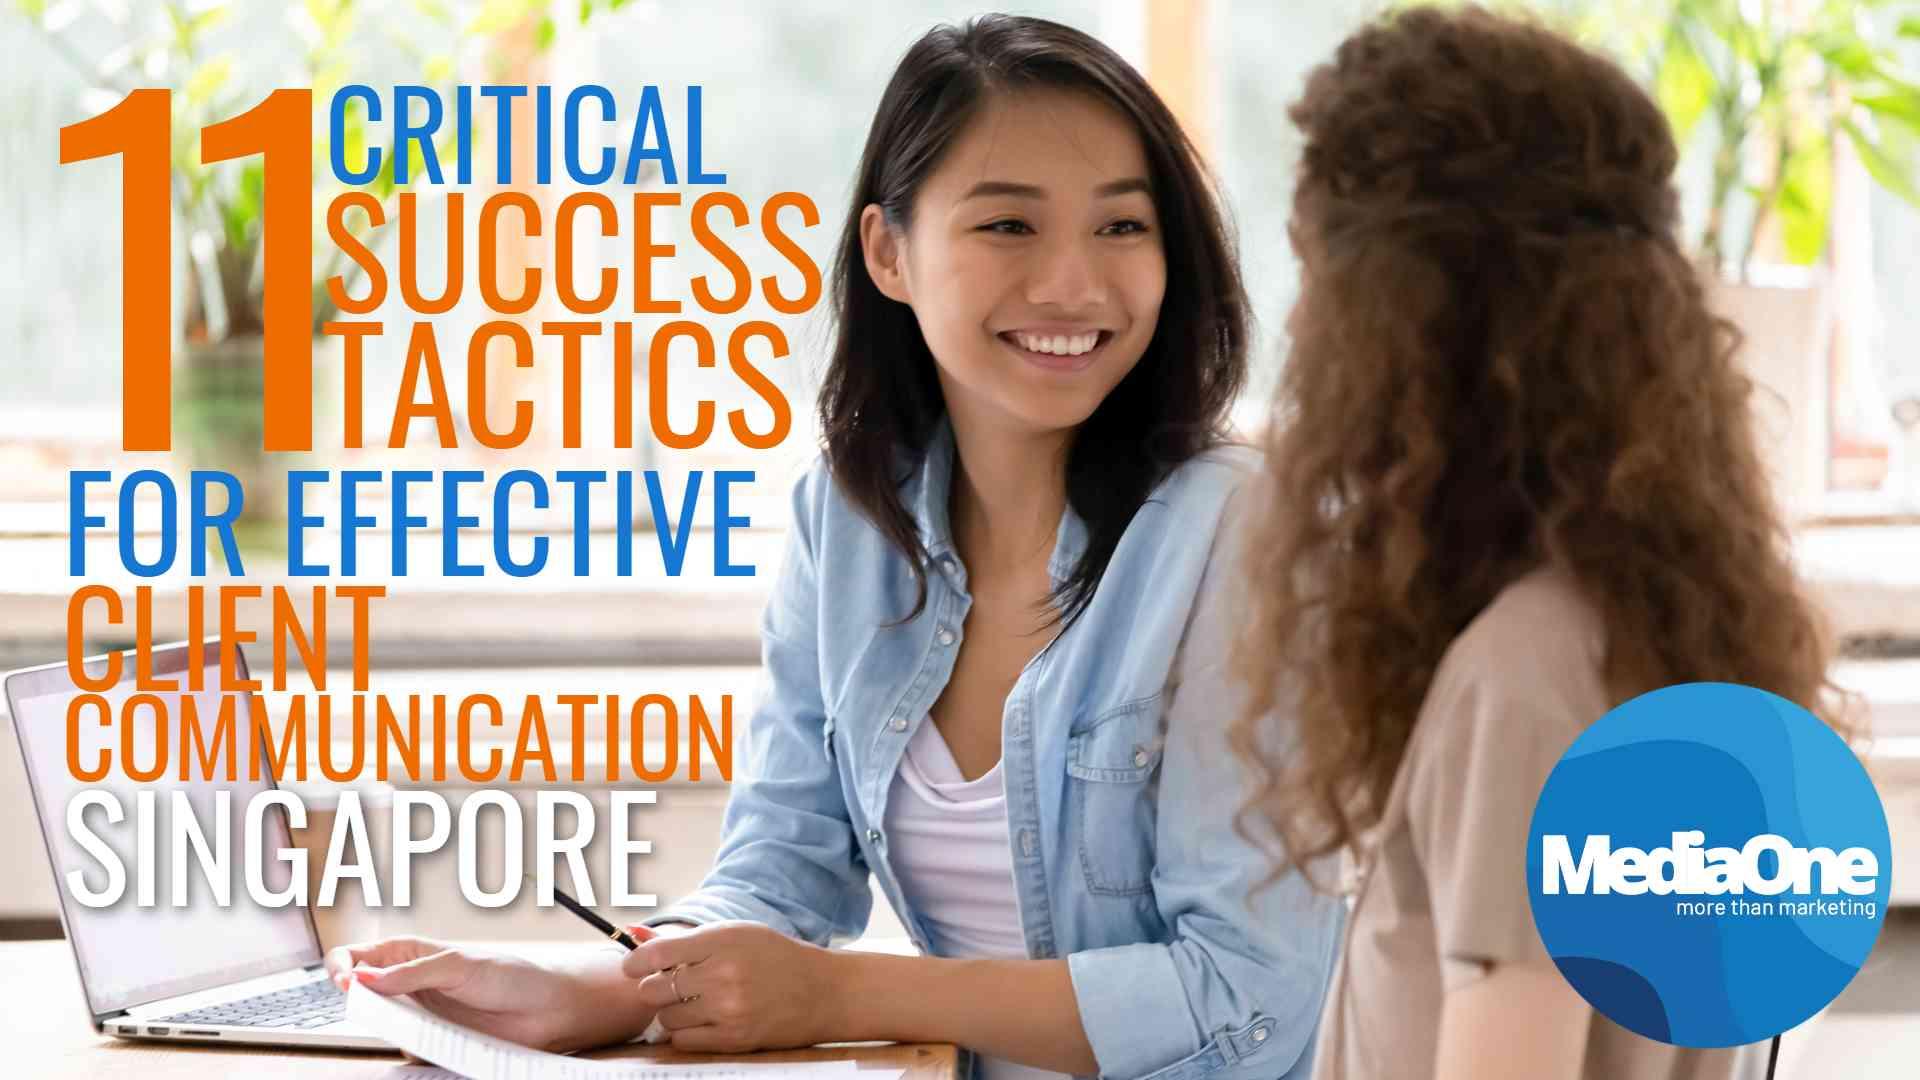 11-critical-success-tactics-for-effective-client-communication-in-singapore-2